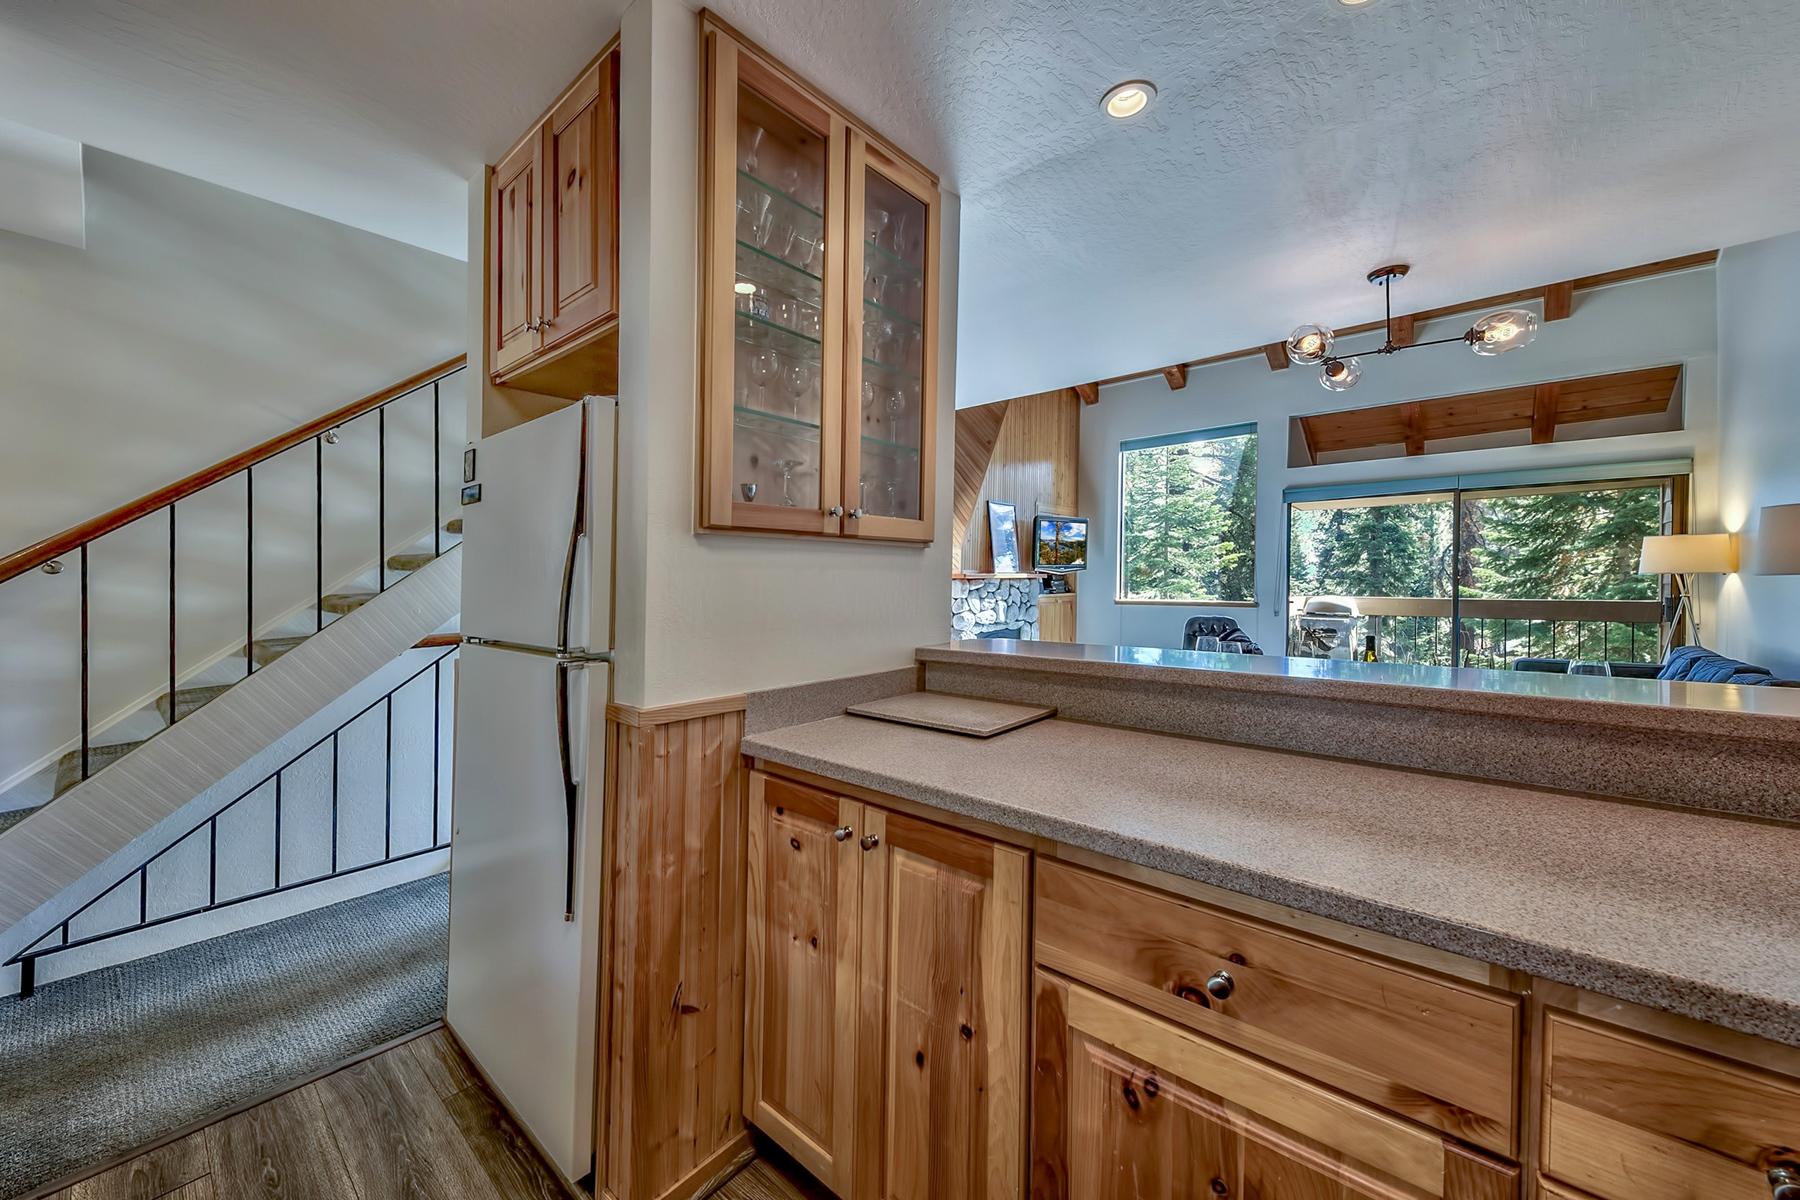 Additional photo for property listing at 5101 North Lake Boulevard #20, Carnelian Bay, CA 5101 North Lake Boulevard #20 Carnelian Bay, California 96140 United States